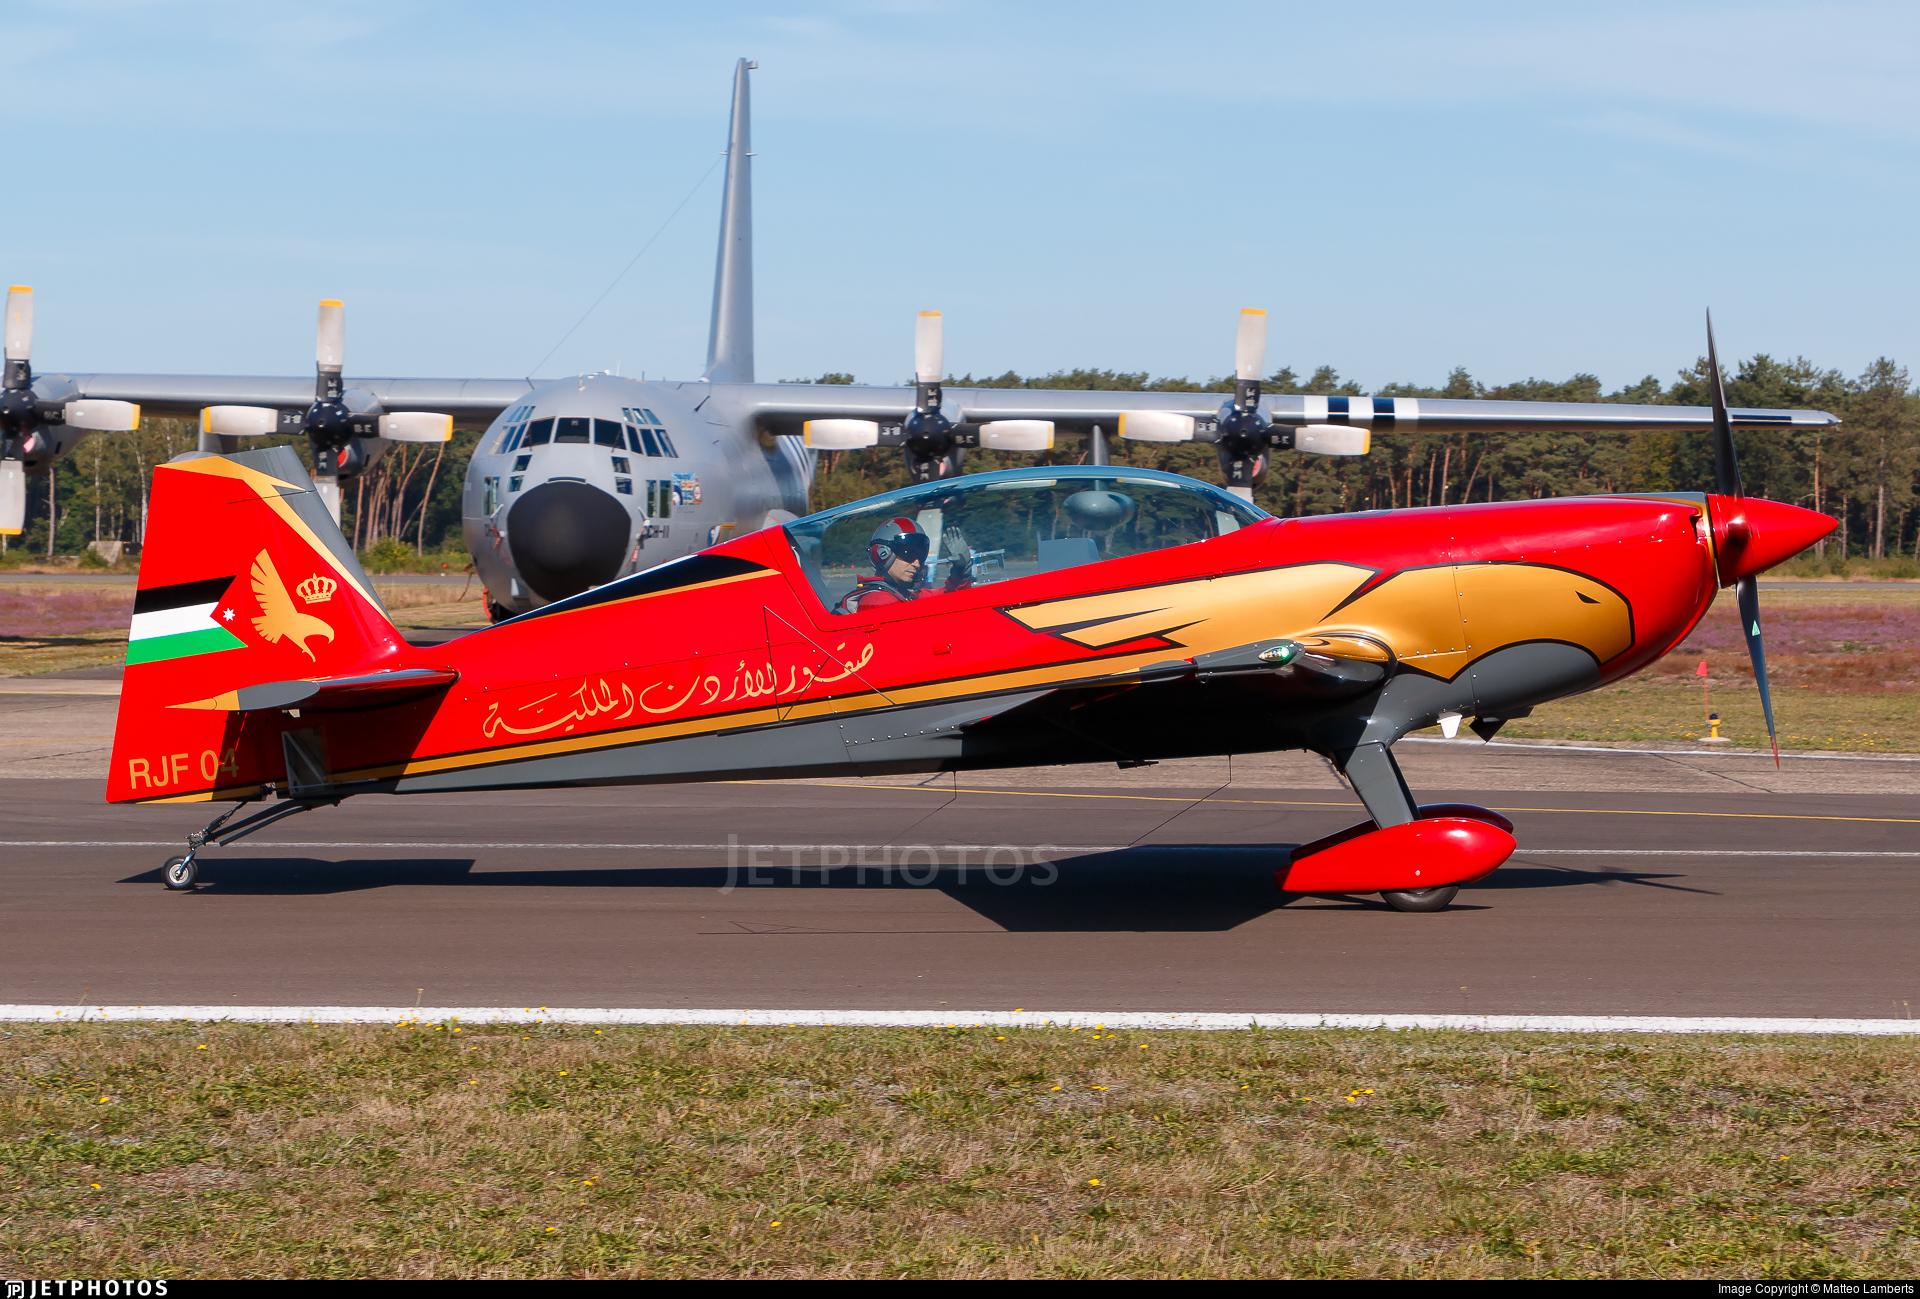 RJF 04 - Extra 330LX - Royal Jordanian Falcons